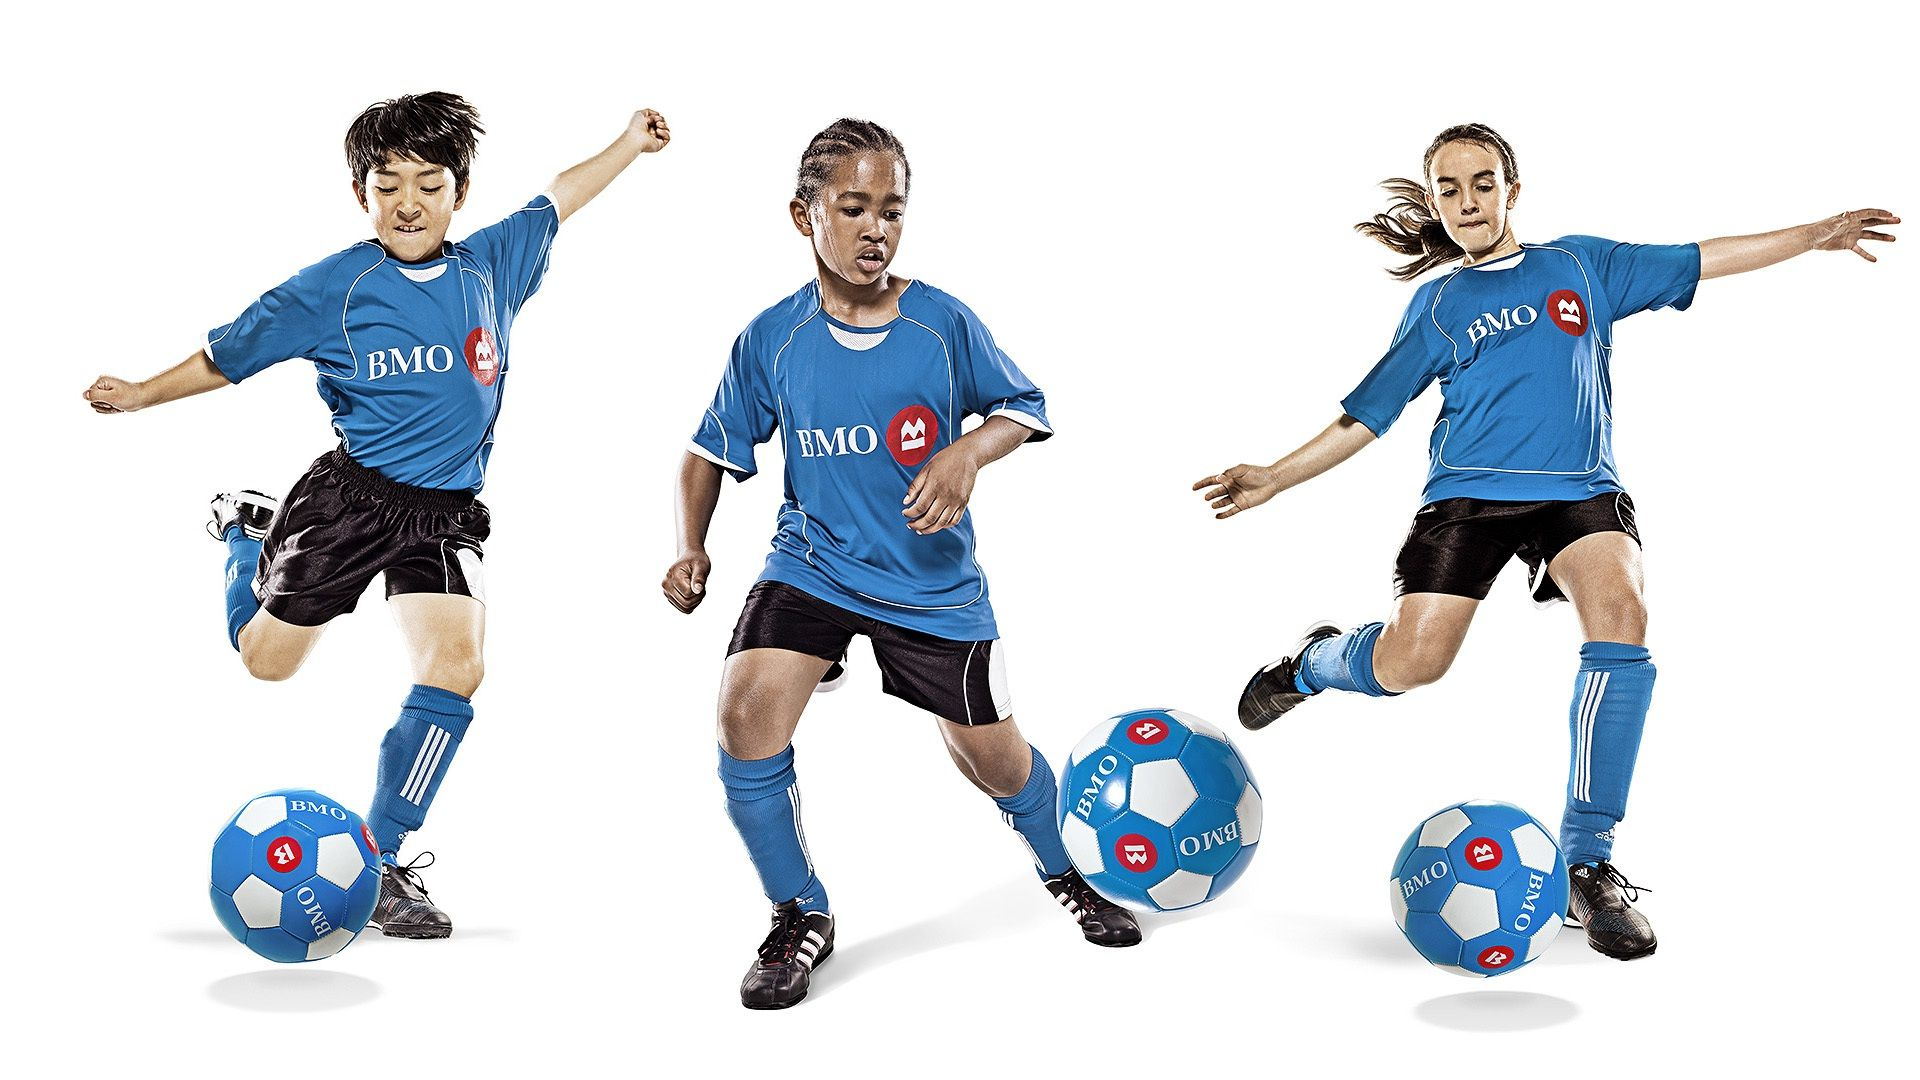 Cute Kids Playing Football Kids Playing Football Girl Playing Soccer Kids Soccer